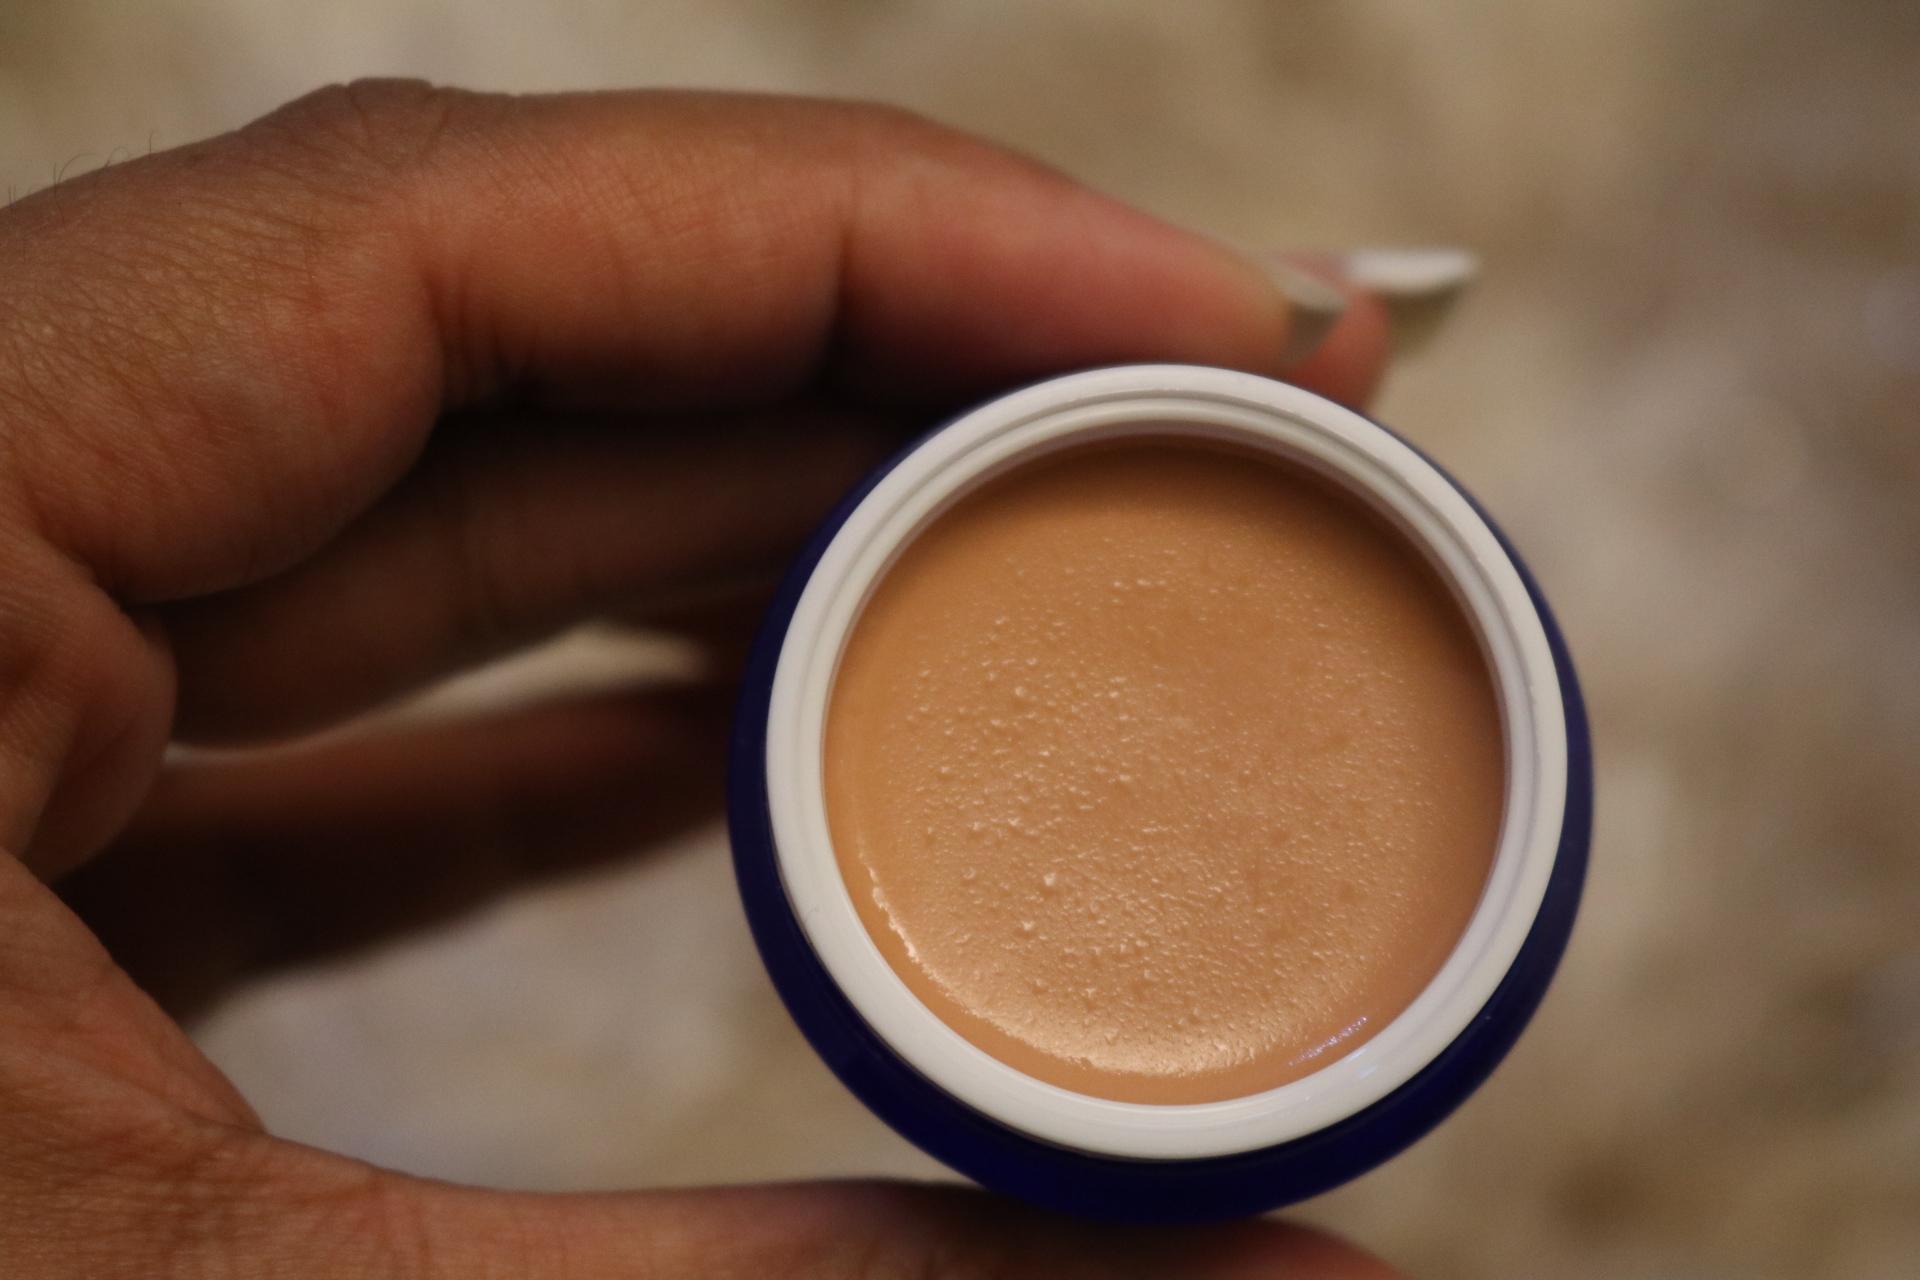 It Cosmetics Bye Bye Under Eye Corrector Concentrate Cream